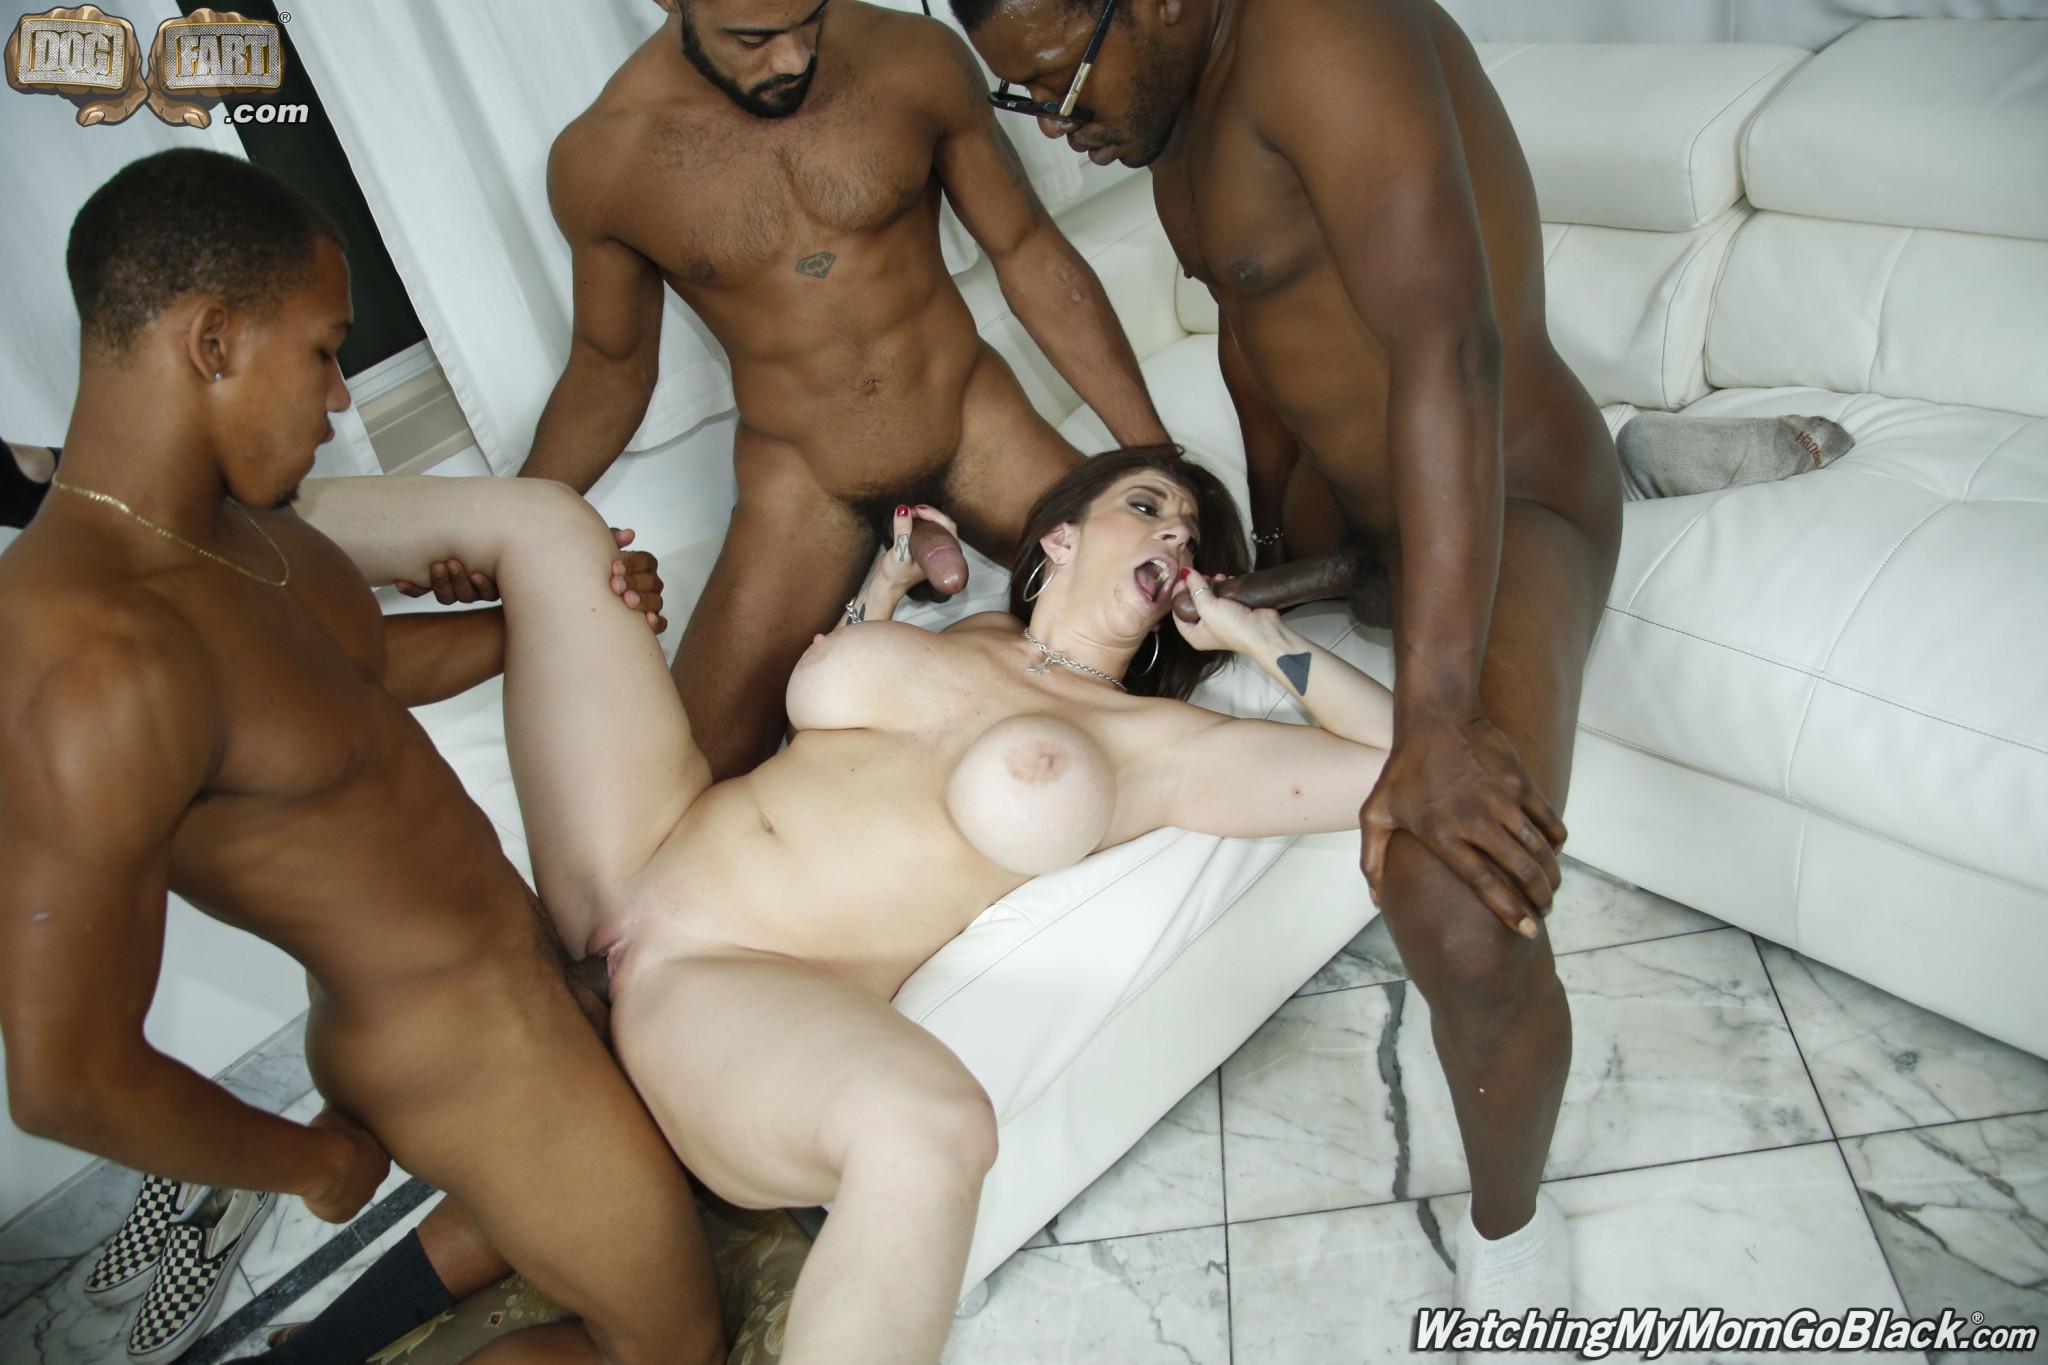 Sara jay interracial